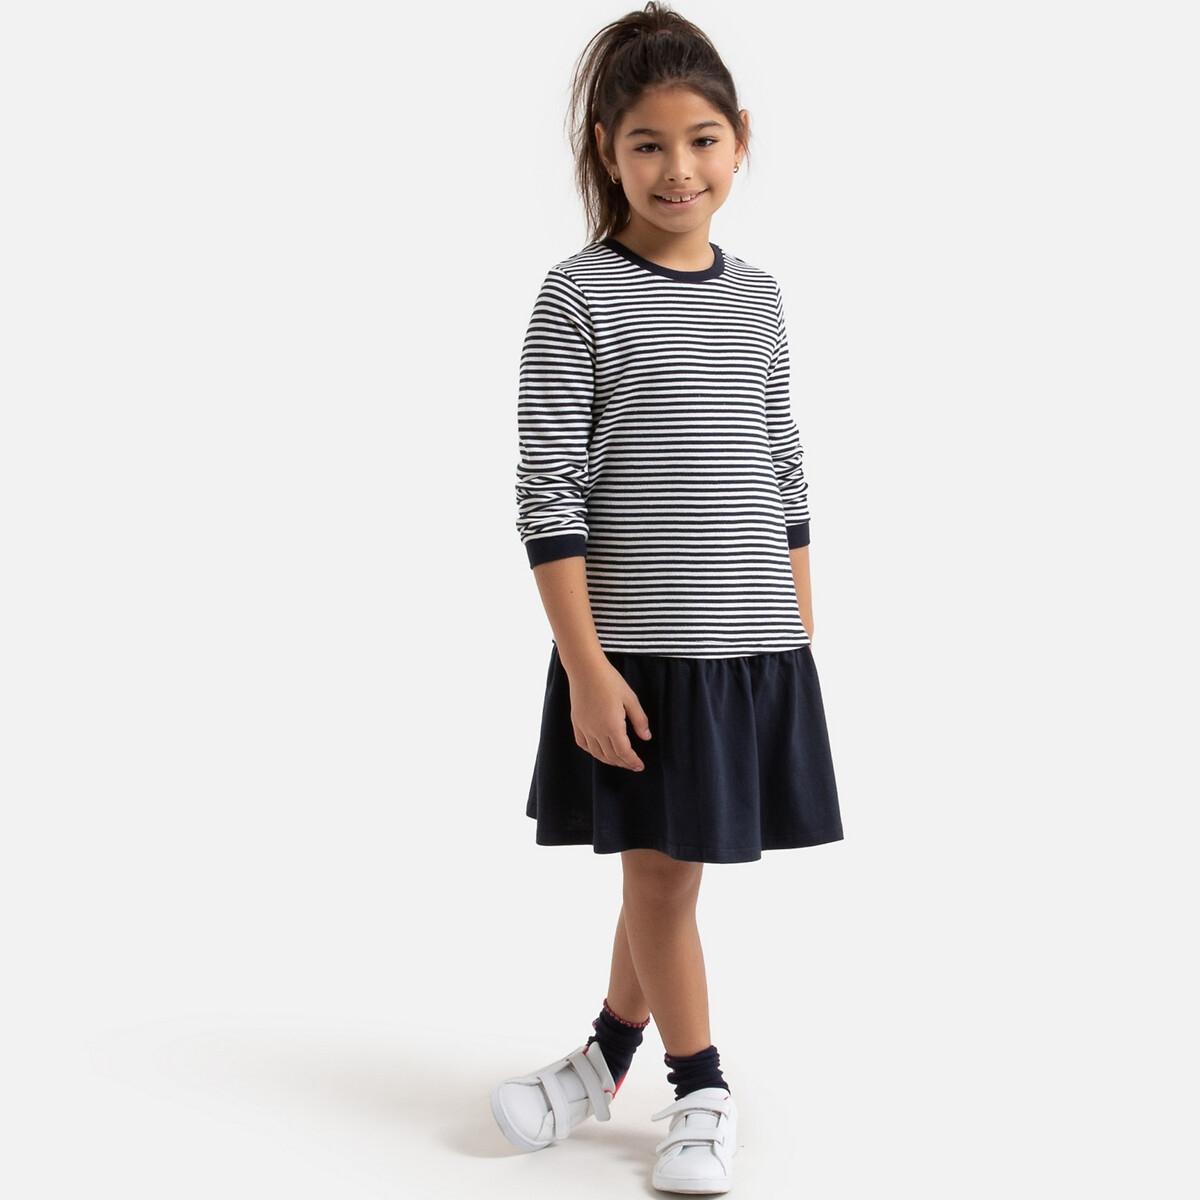 2 In 1 Breton Stripe Dress In Cotton Mix 3 12 Years